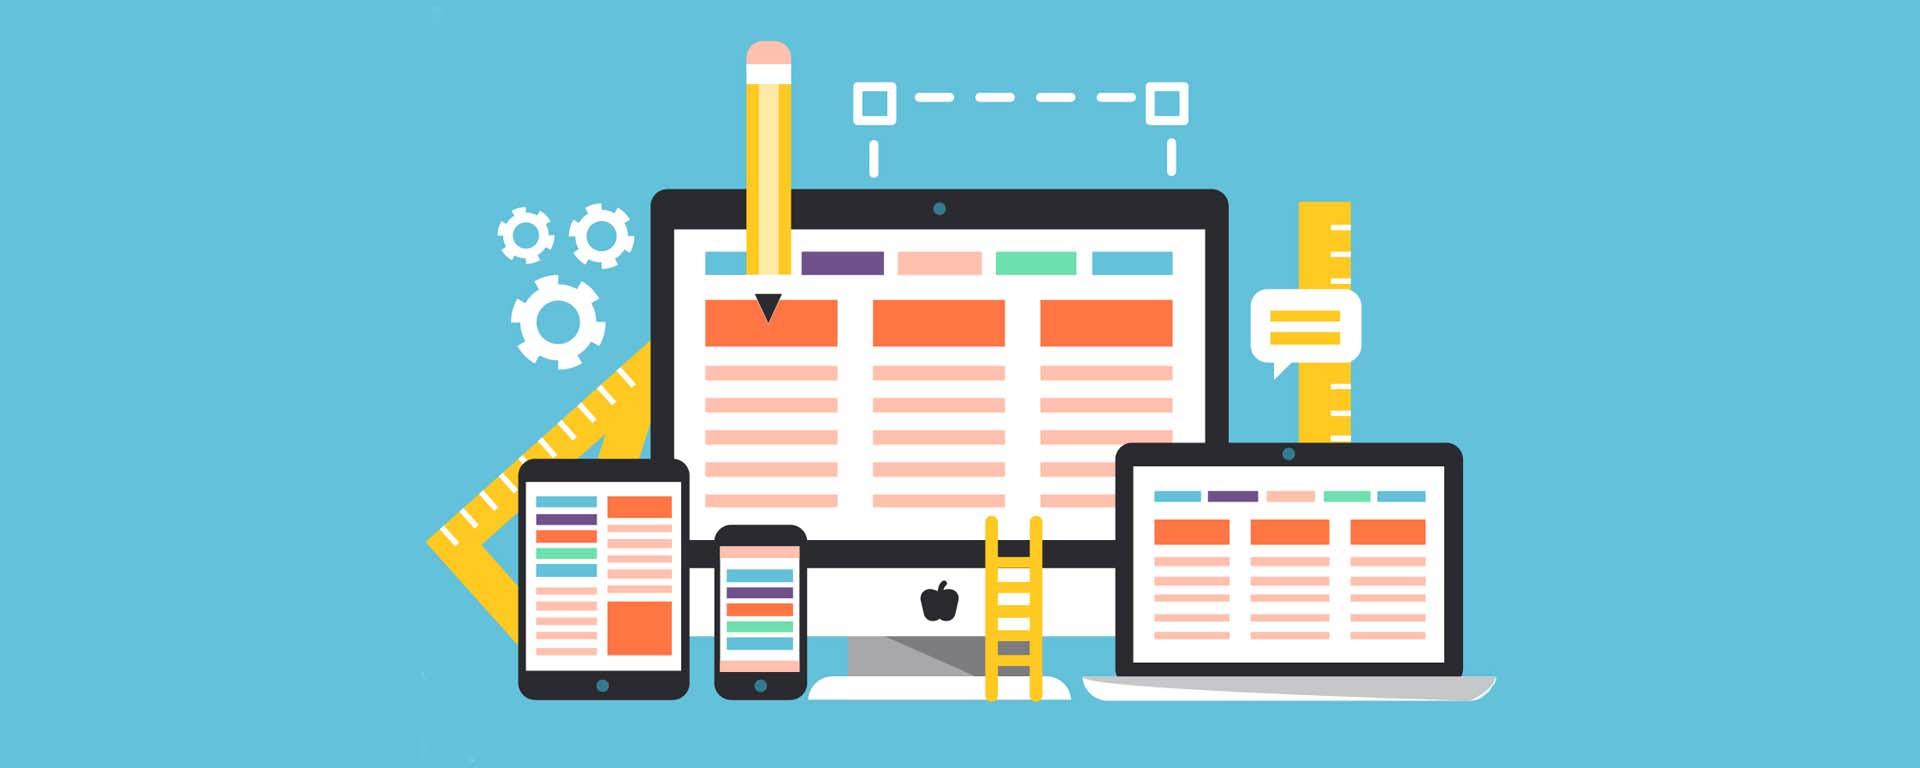 Responsive web design coding